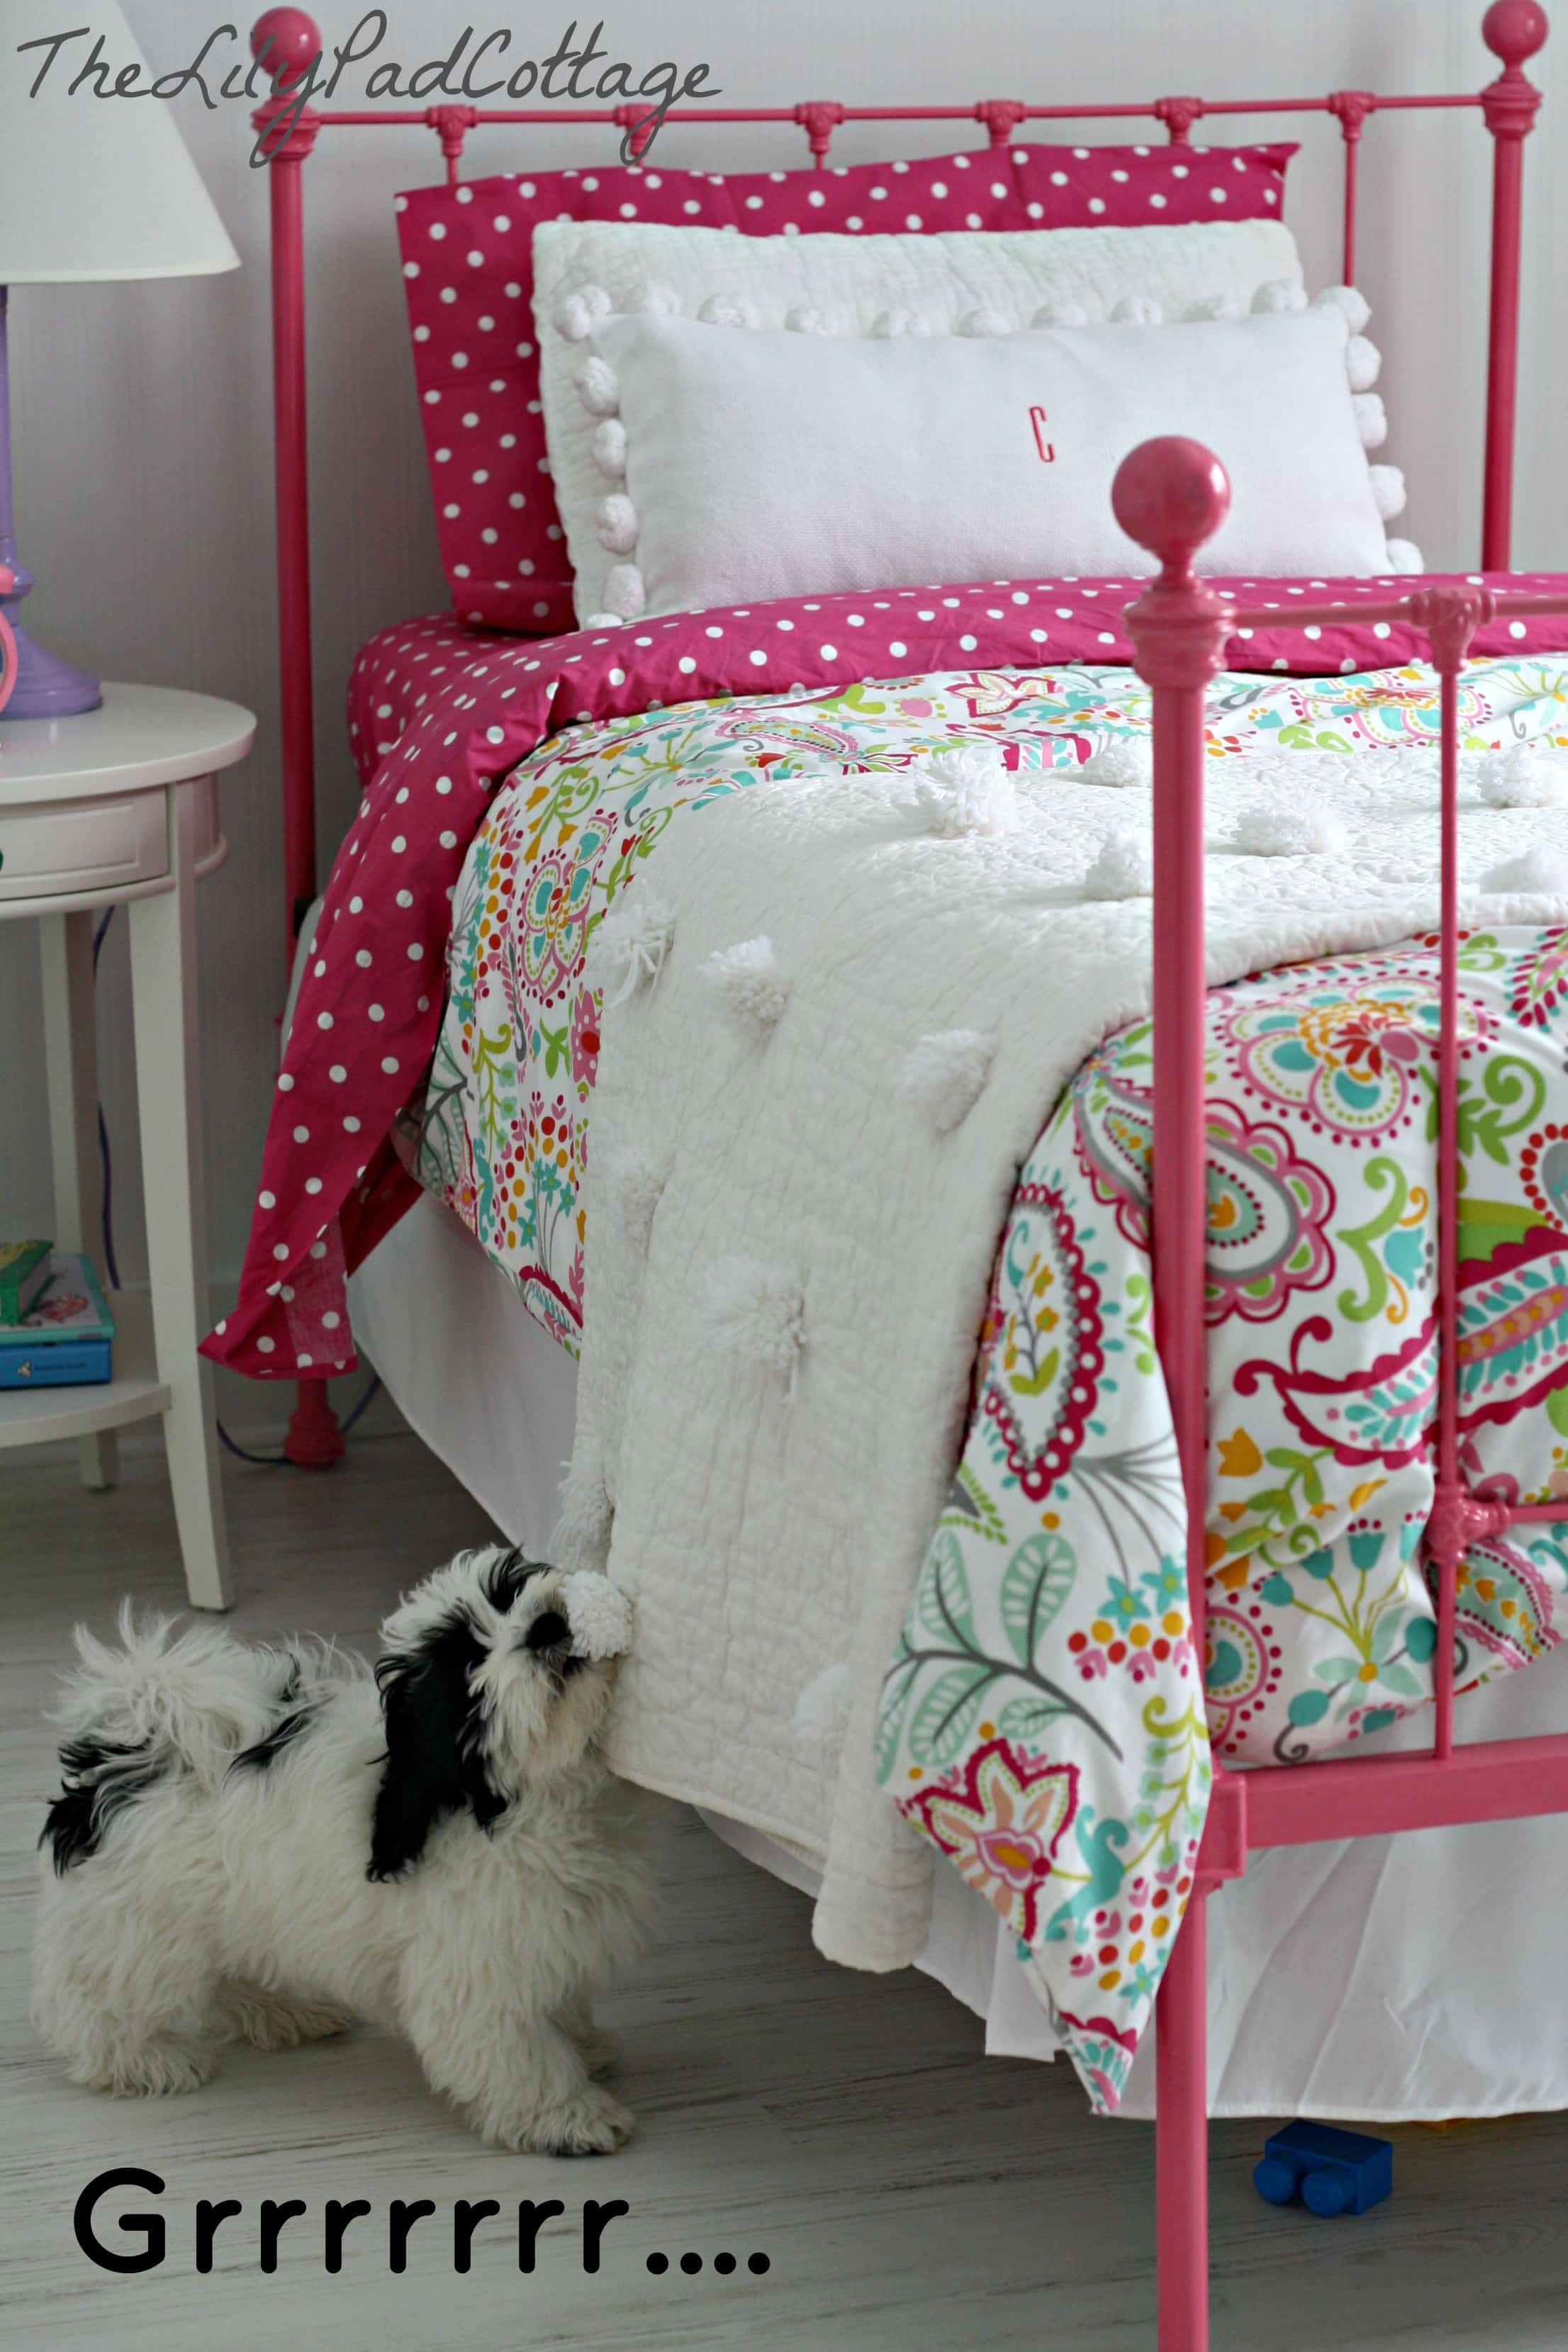 Easy No Sew Pom Pom Quilt The Lilypad Cottage